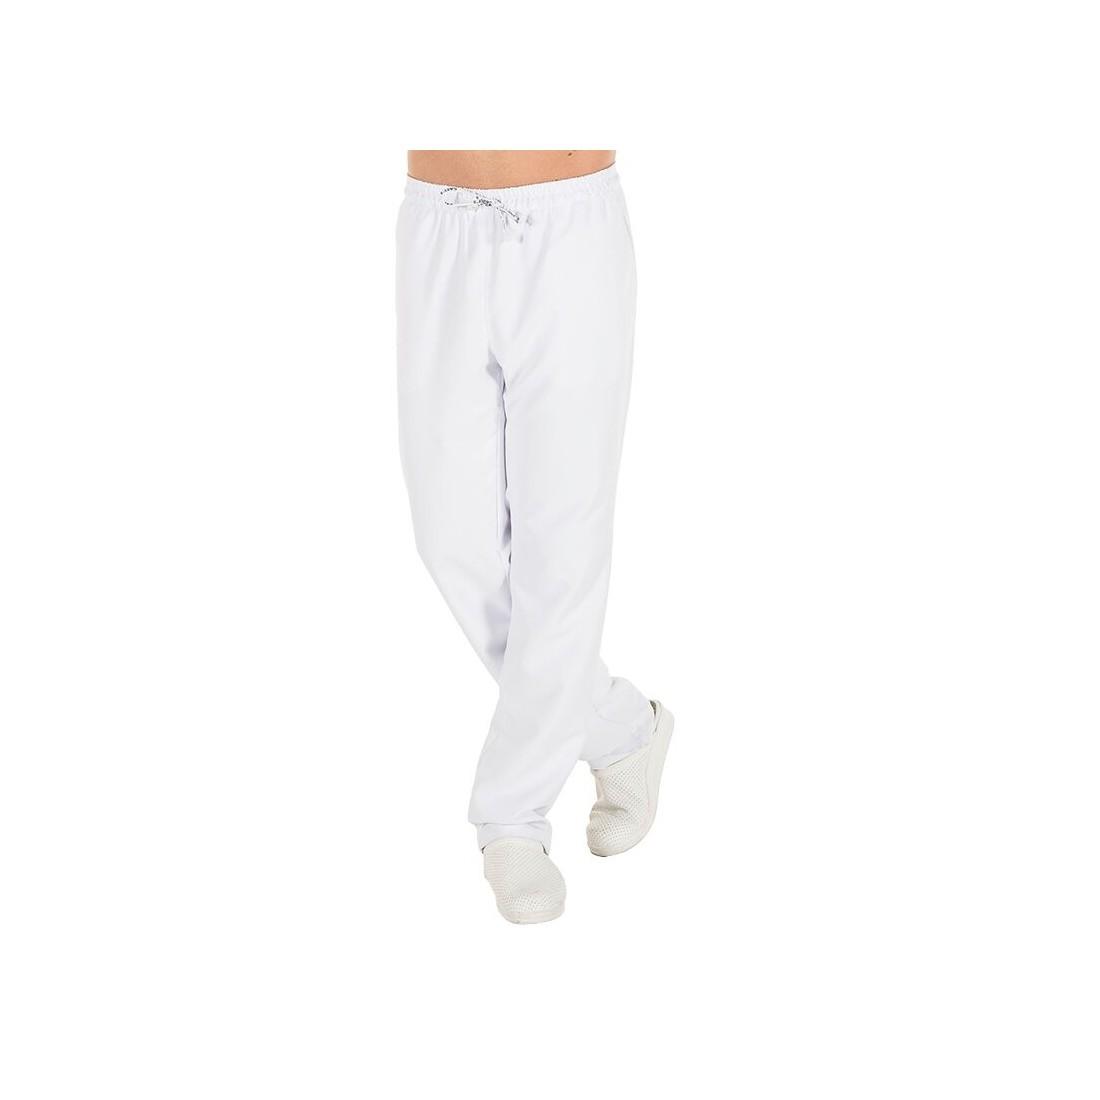 Pantalón microfibra unisex